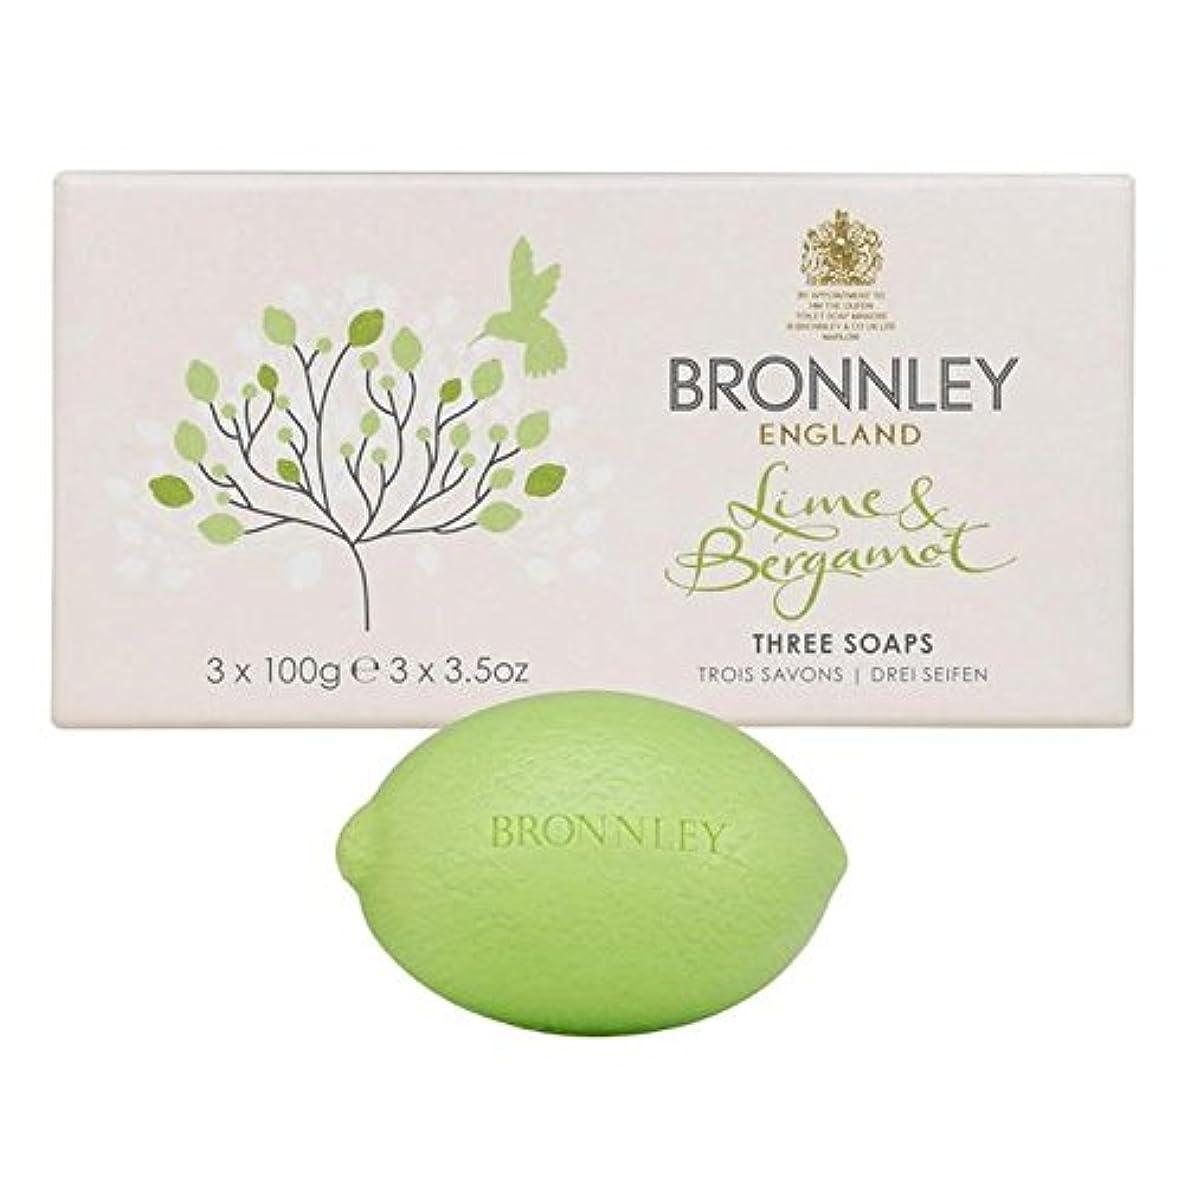 Bronnley Lime & Bergamot Soap 3 x 100g (Pack of 6) - ライム&ベルガモット石鹸3×100グラム x6 [並行輸入品]